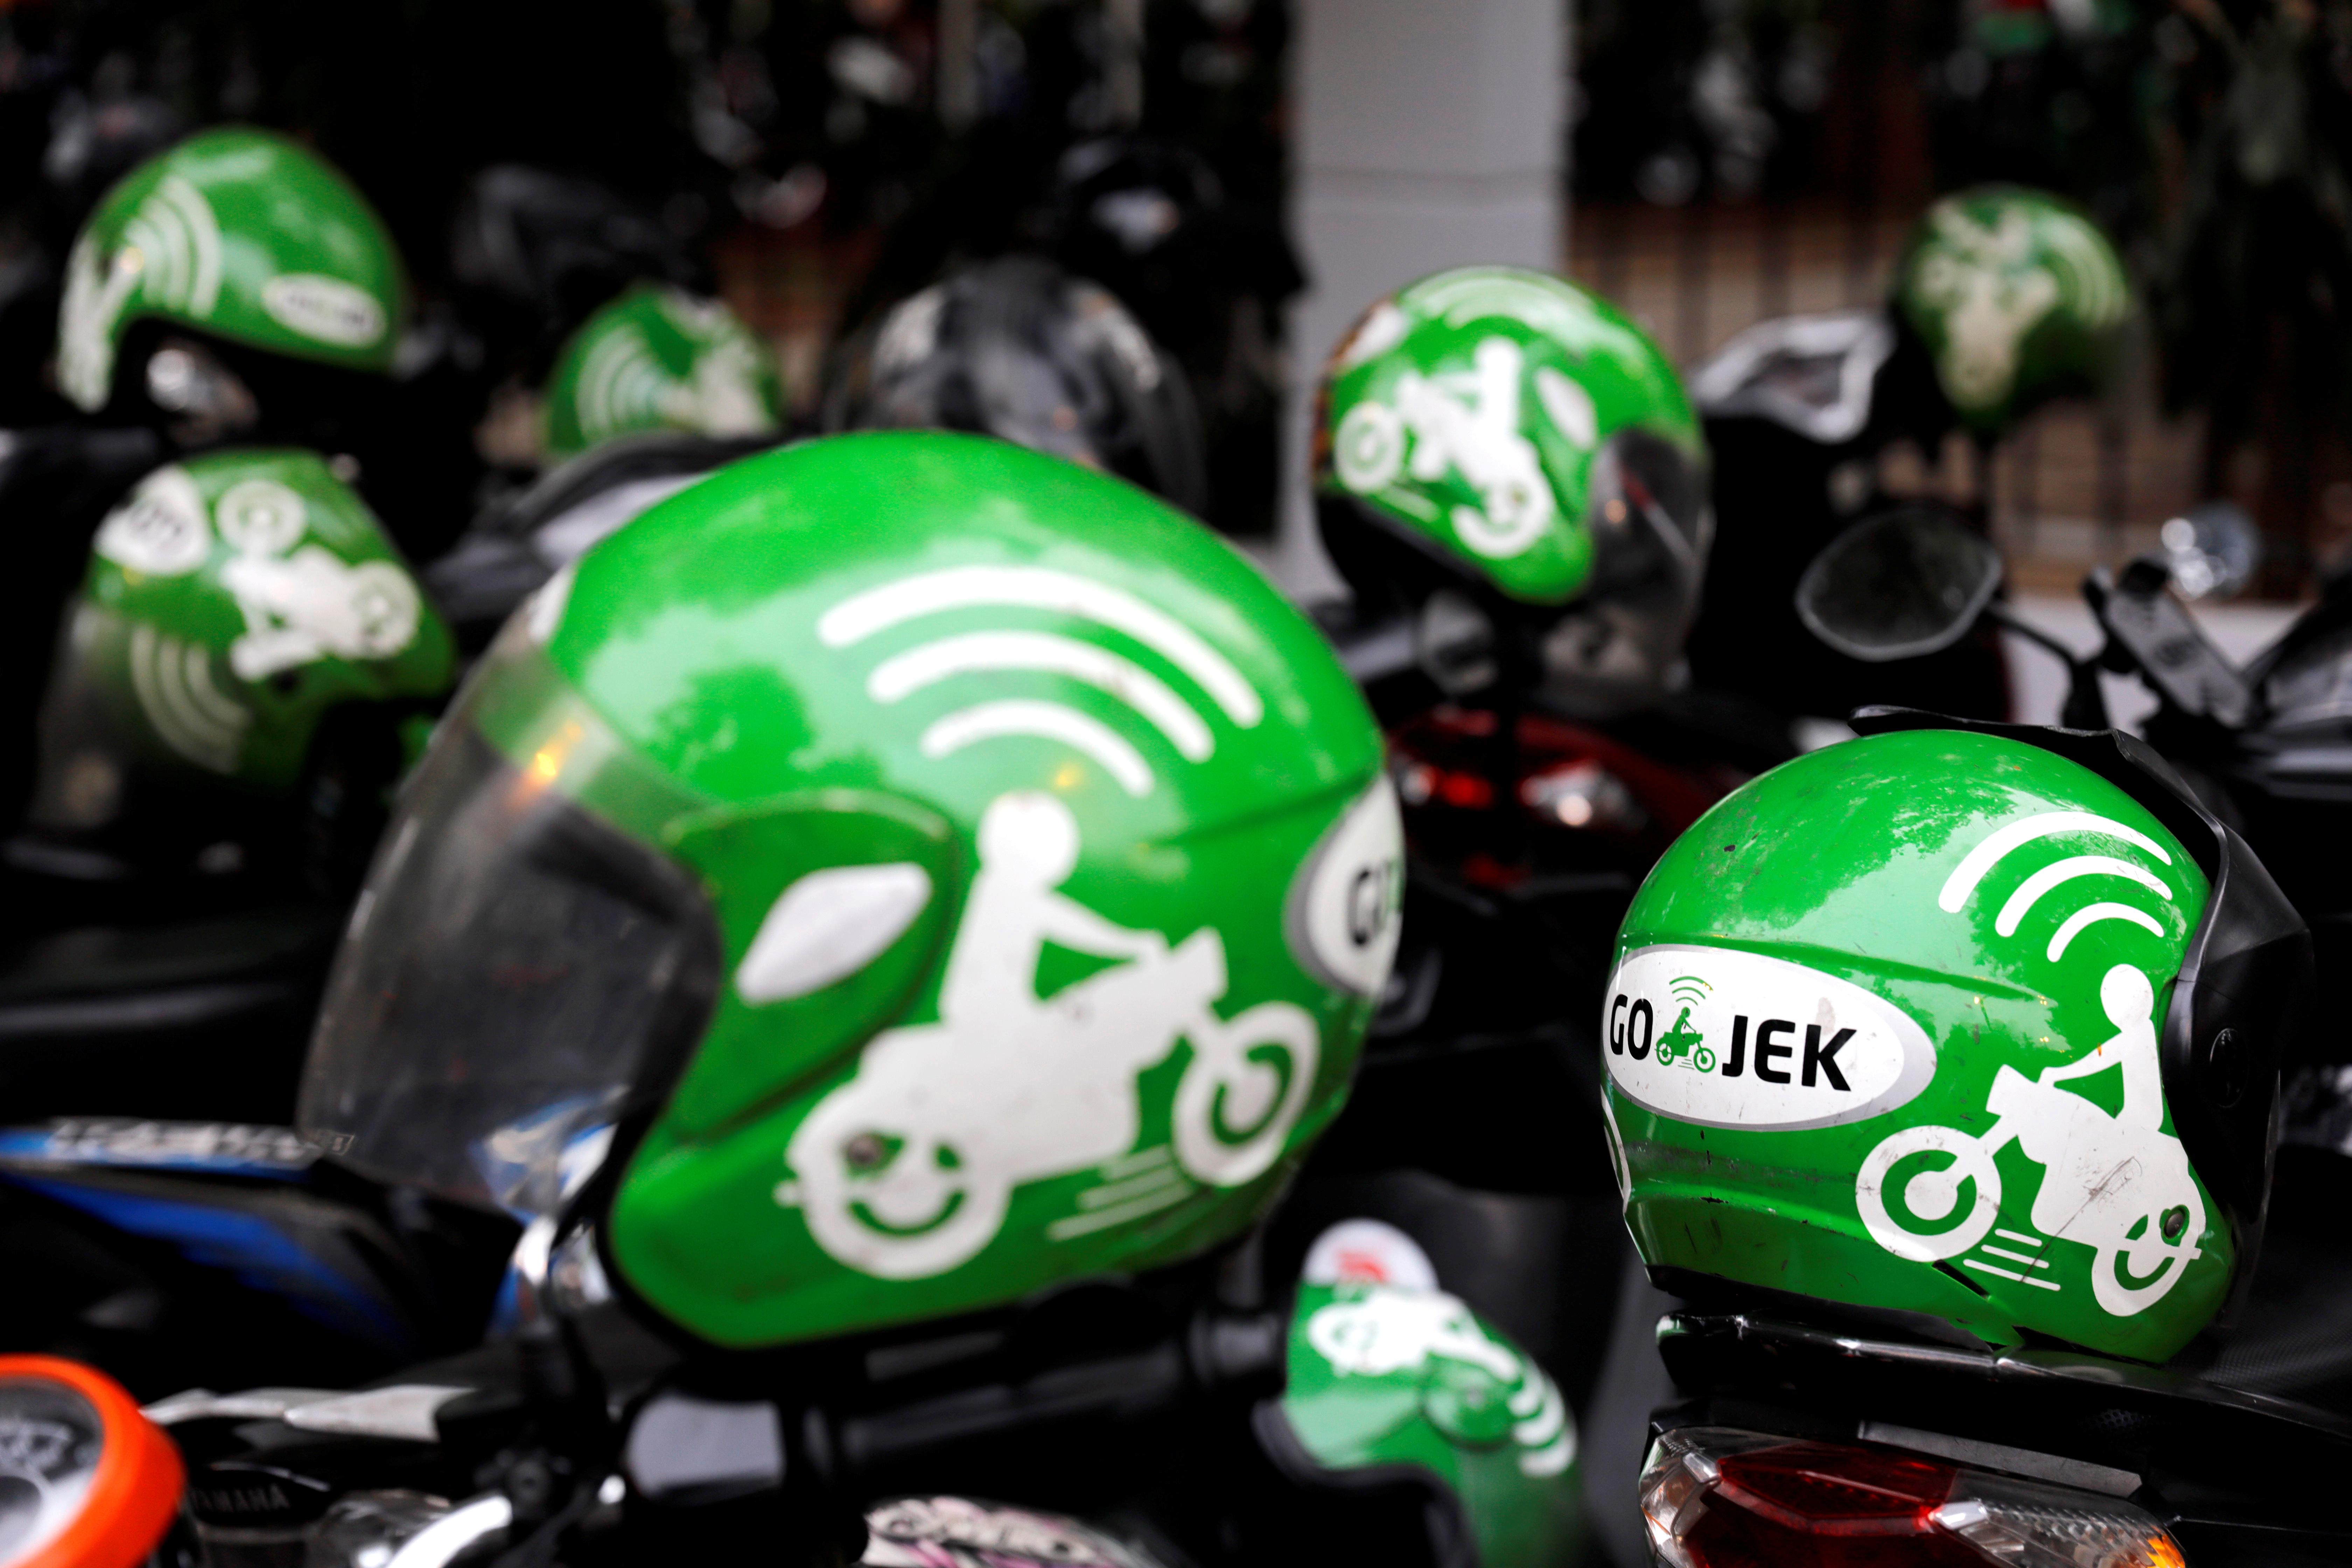 FILE PHOTO: Gojek driver helmets are seen during Go-Food festival in Jakarta, Indonesia, October 27, 2018. REUTERS/Beawiharta